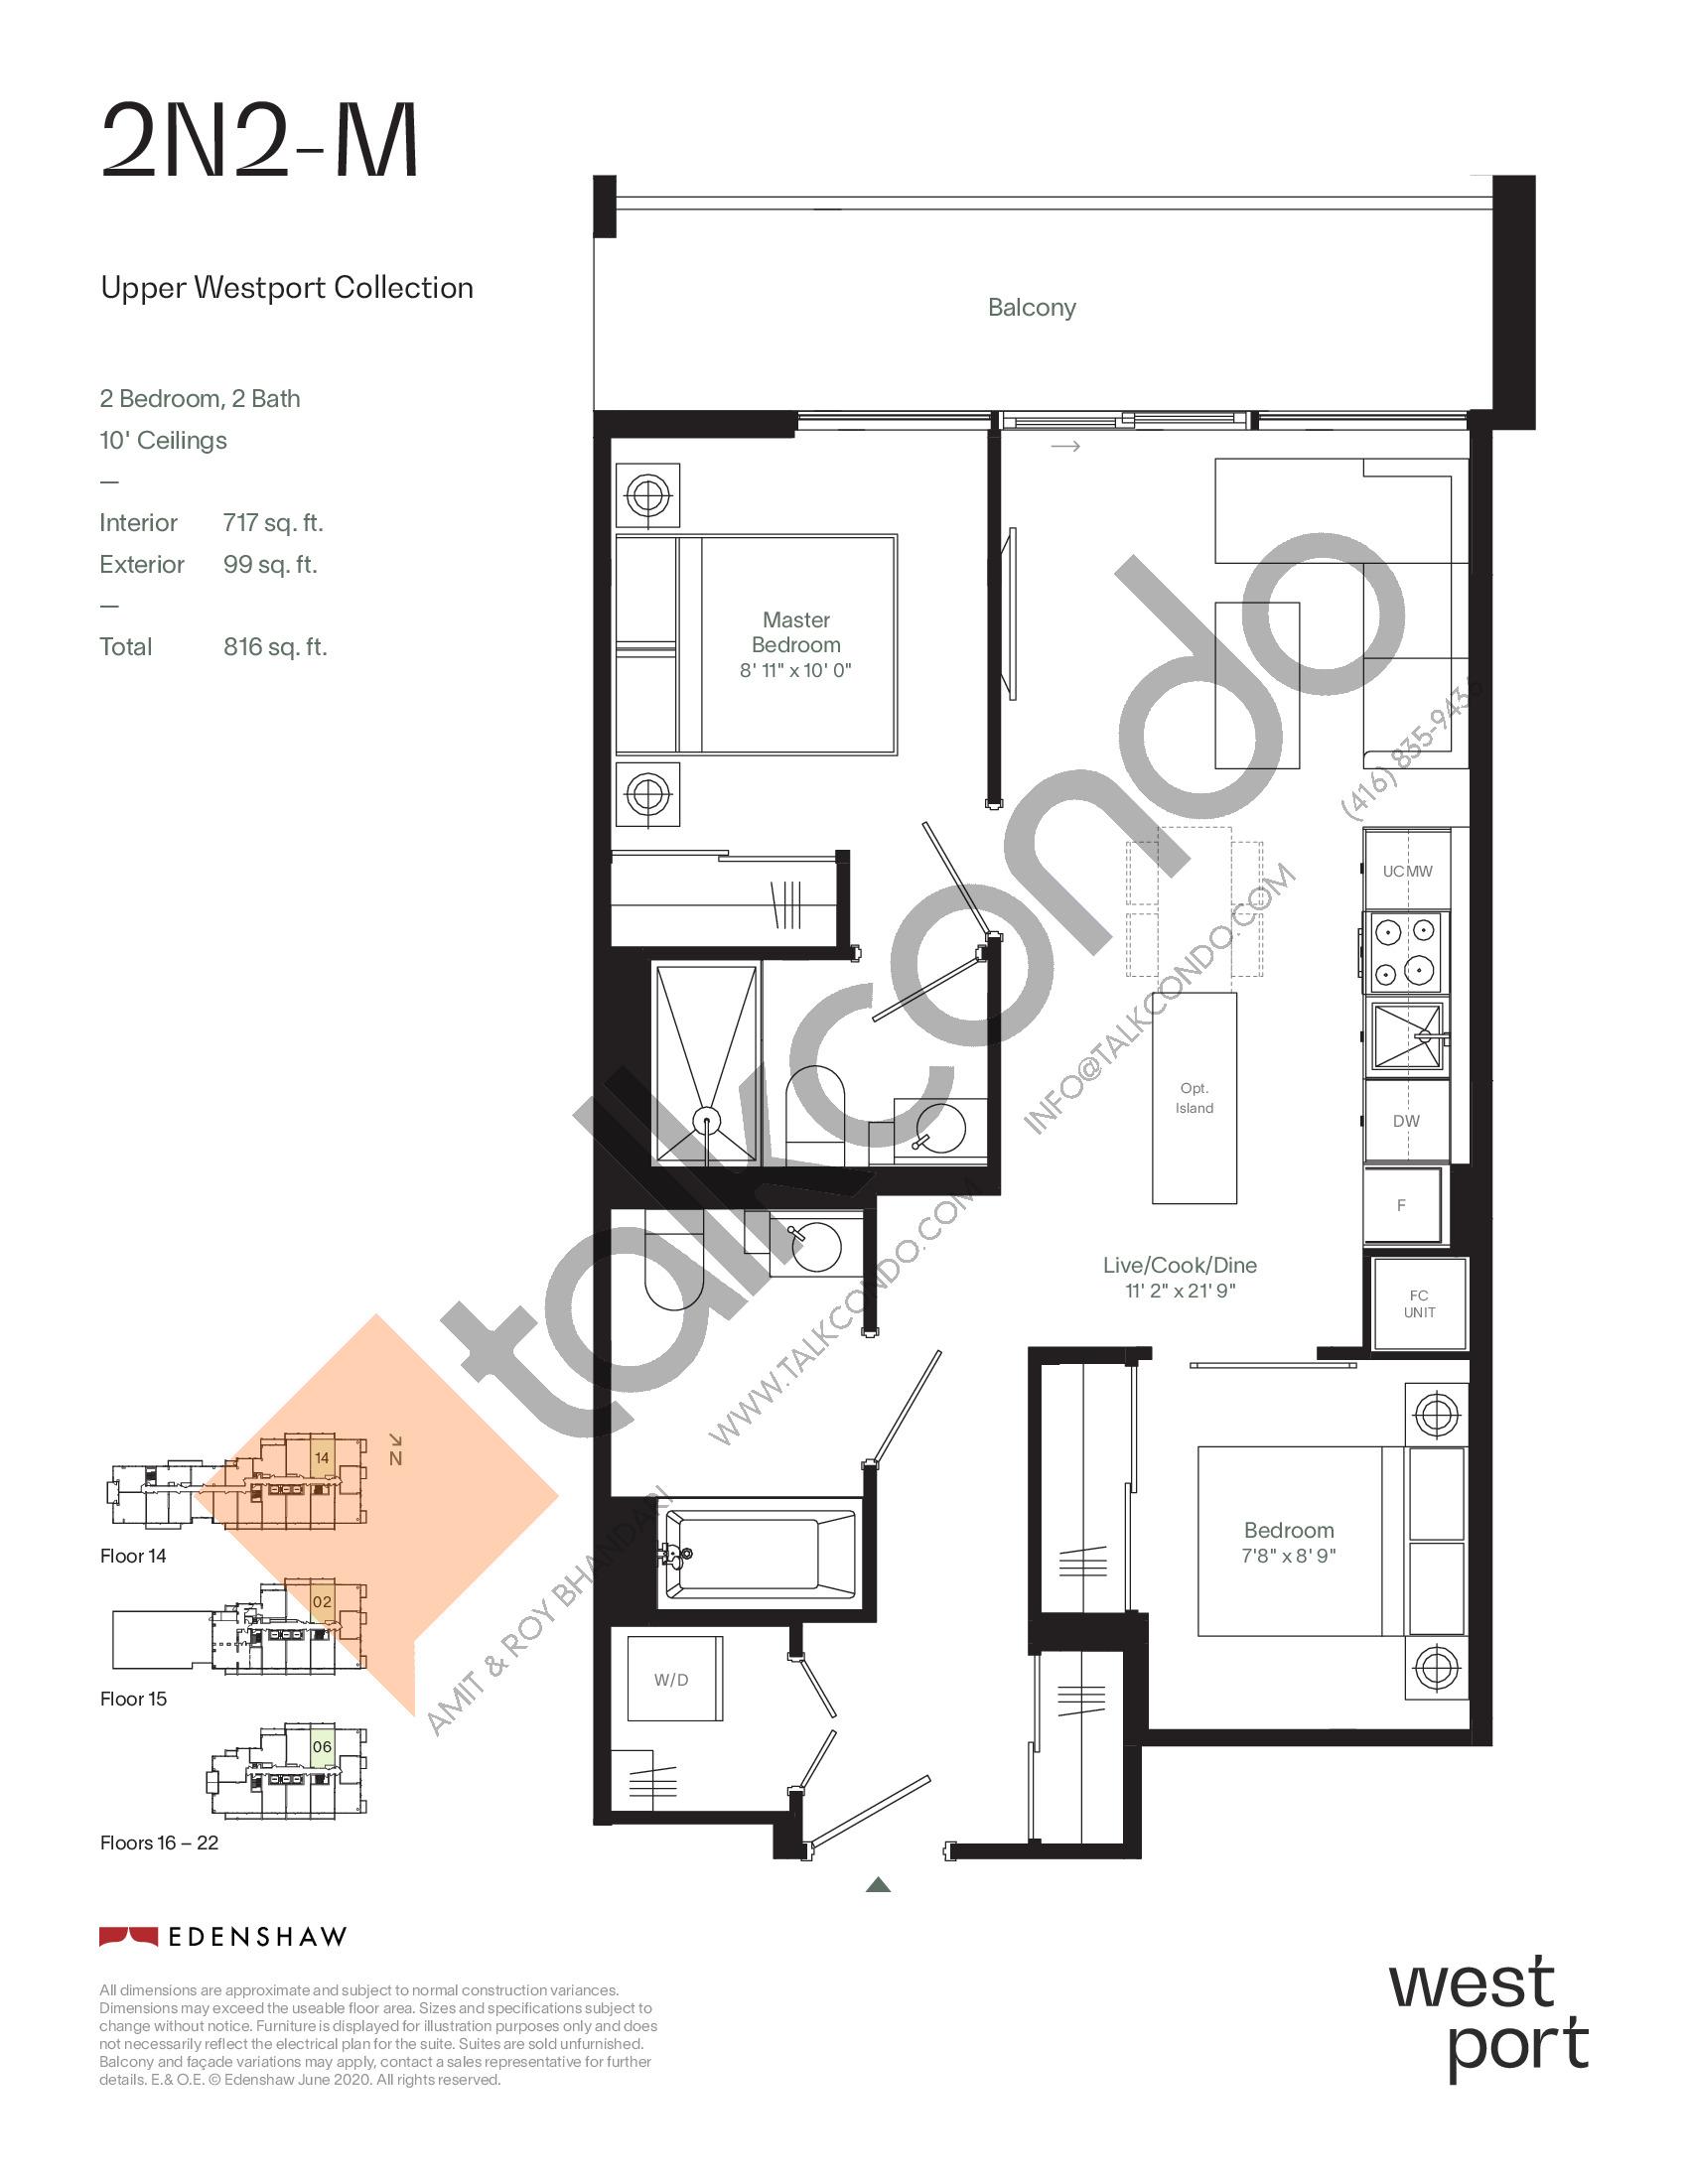 2N2-M - Upper Westport Collection Floor Plan at Westport Condos - 717 sq.ft